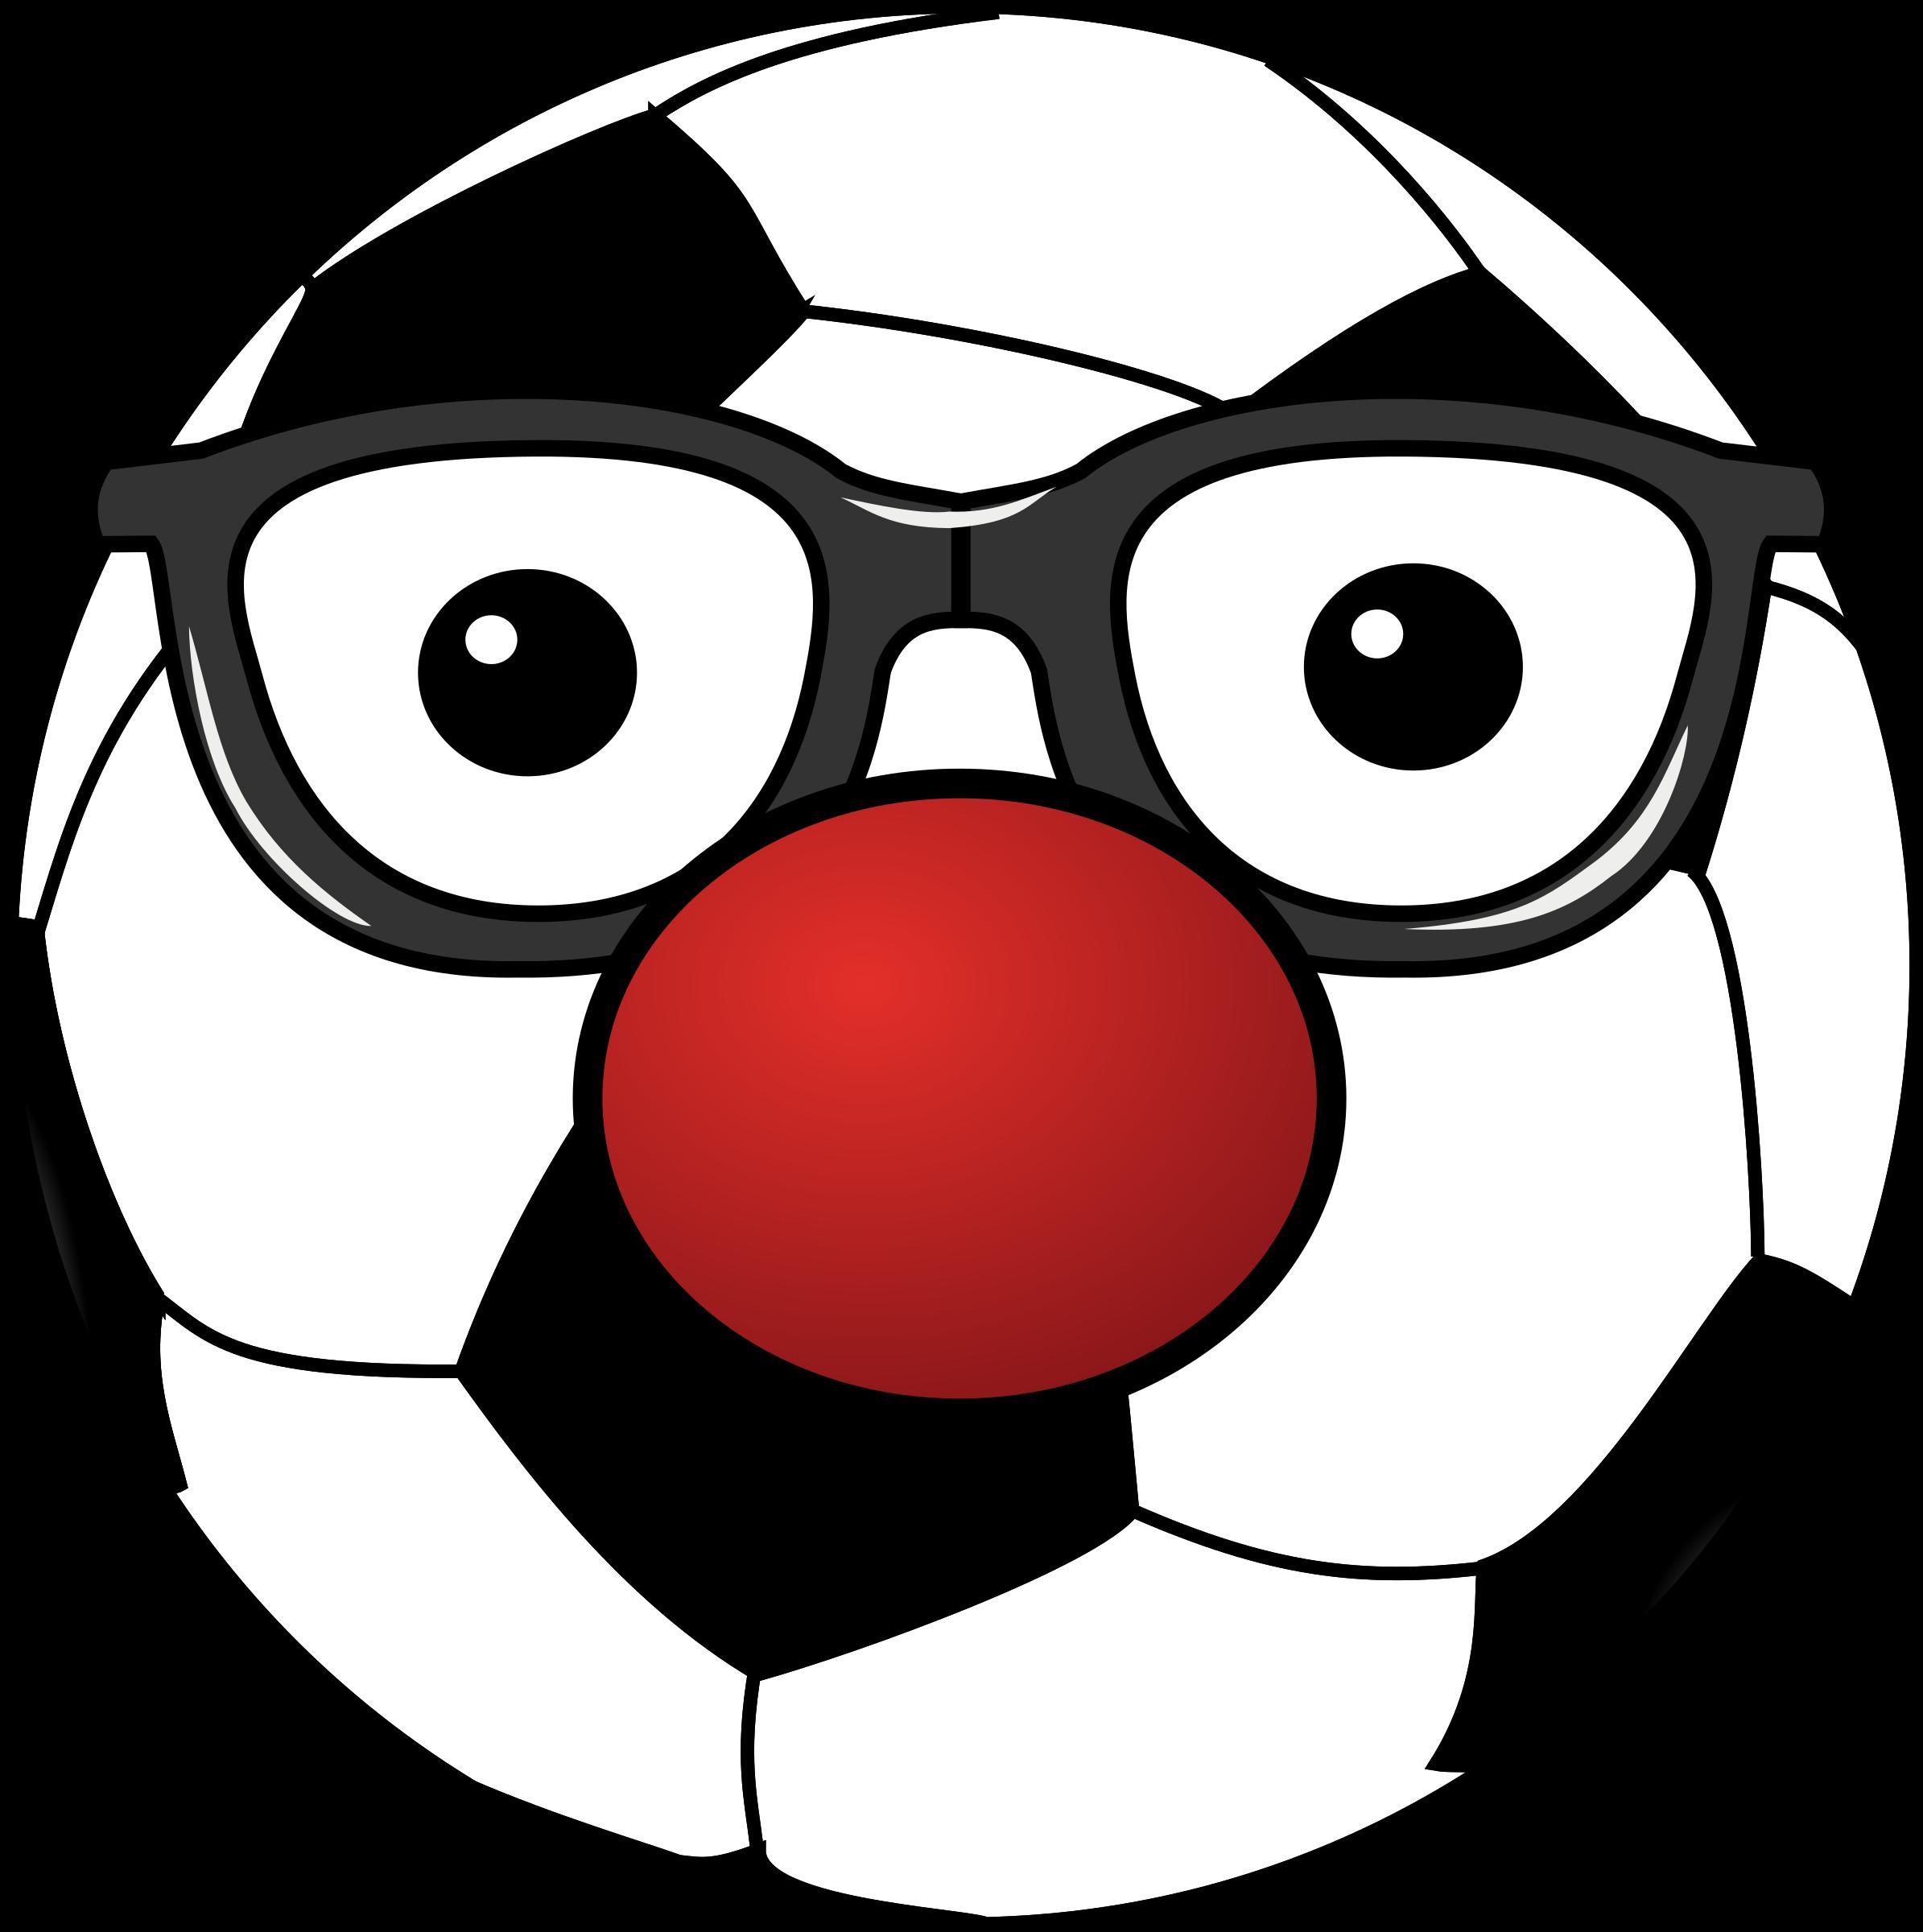 2389x2400 Soccer Ball Black And White Clip Art